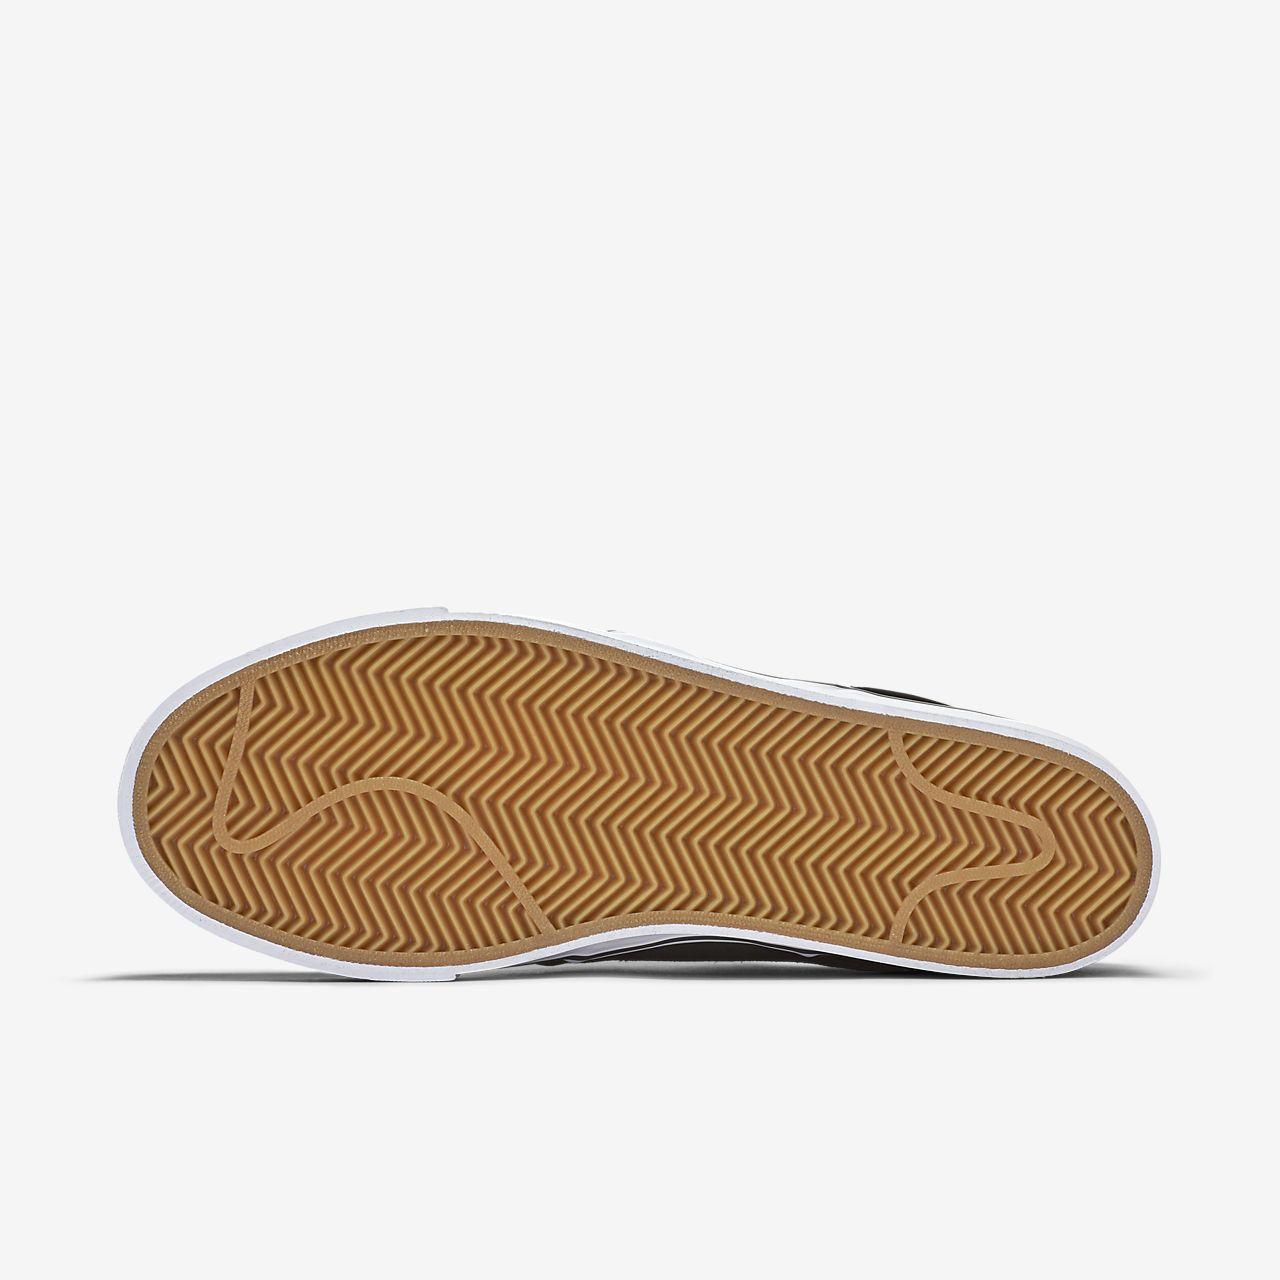 c40fc20711df Nike SB Zoom Stefan Janoski OG Men s Skate Shoe. Nike.com CA